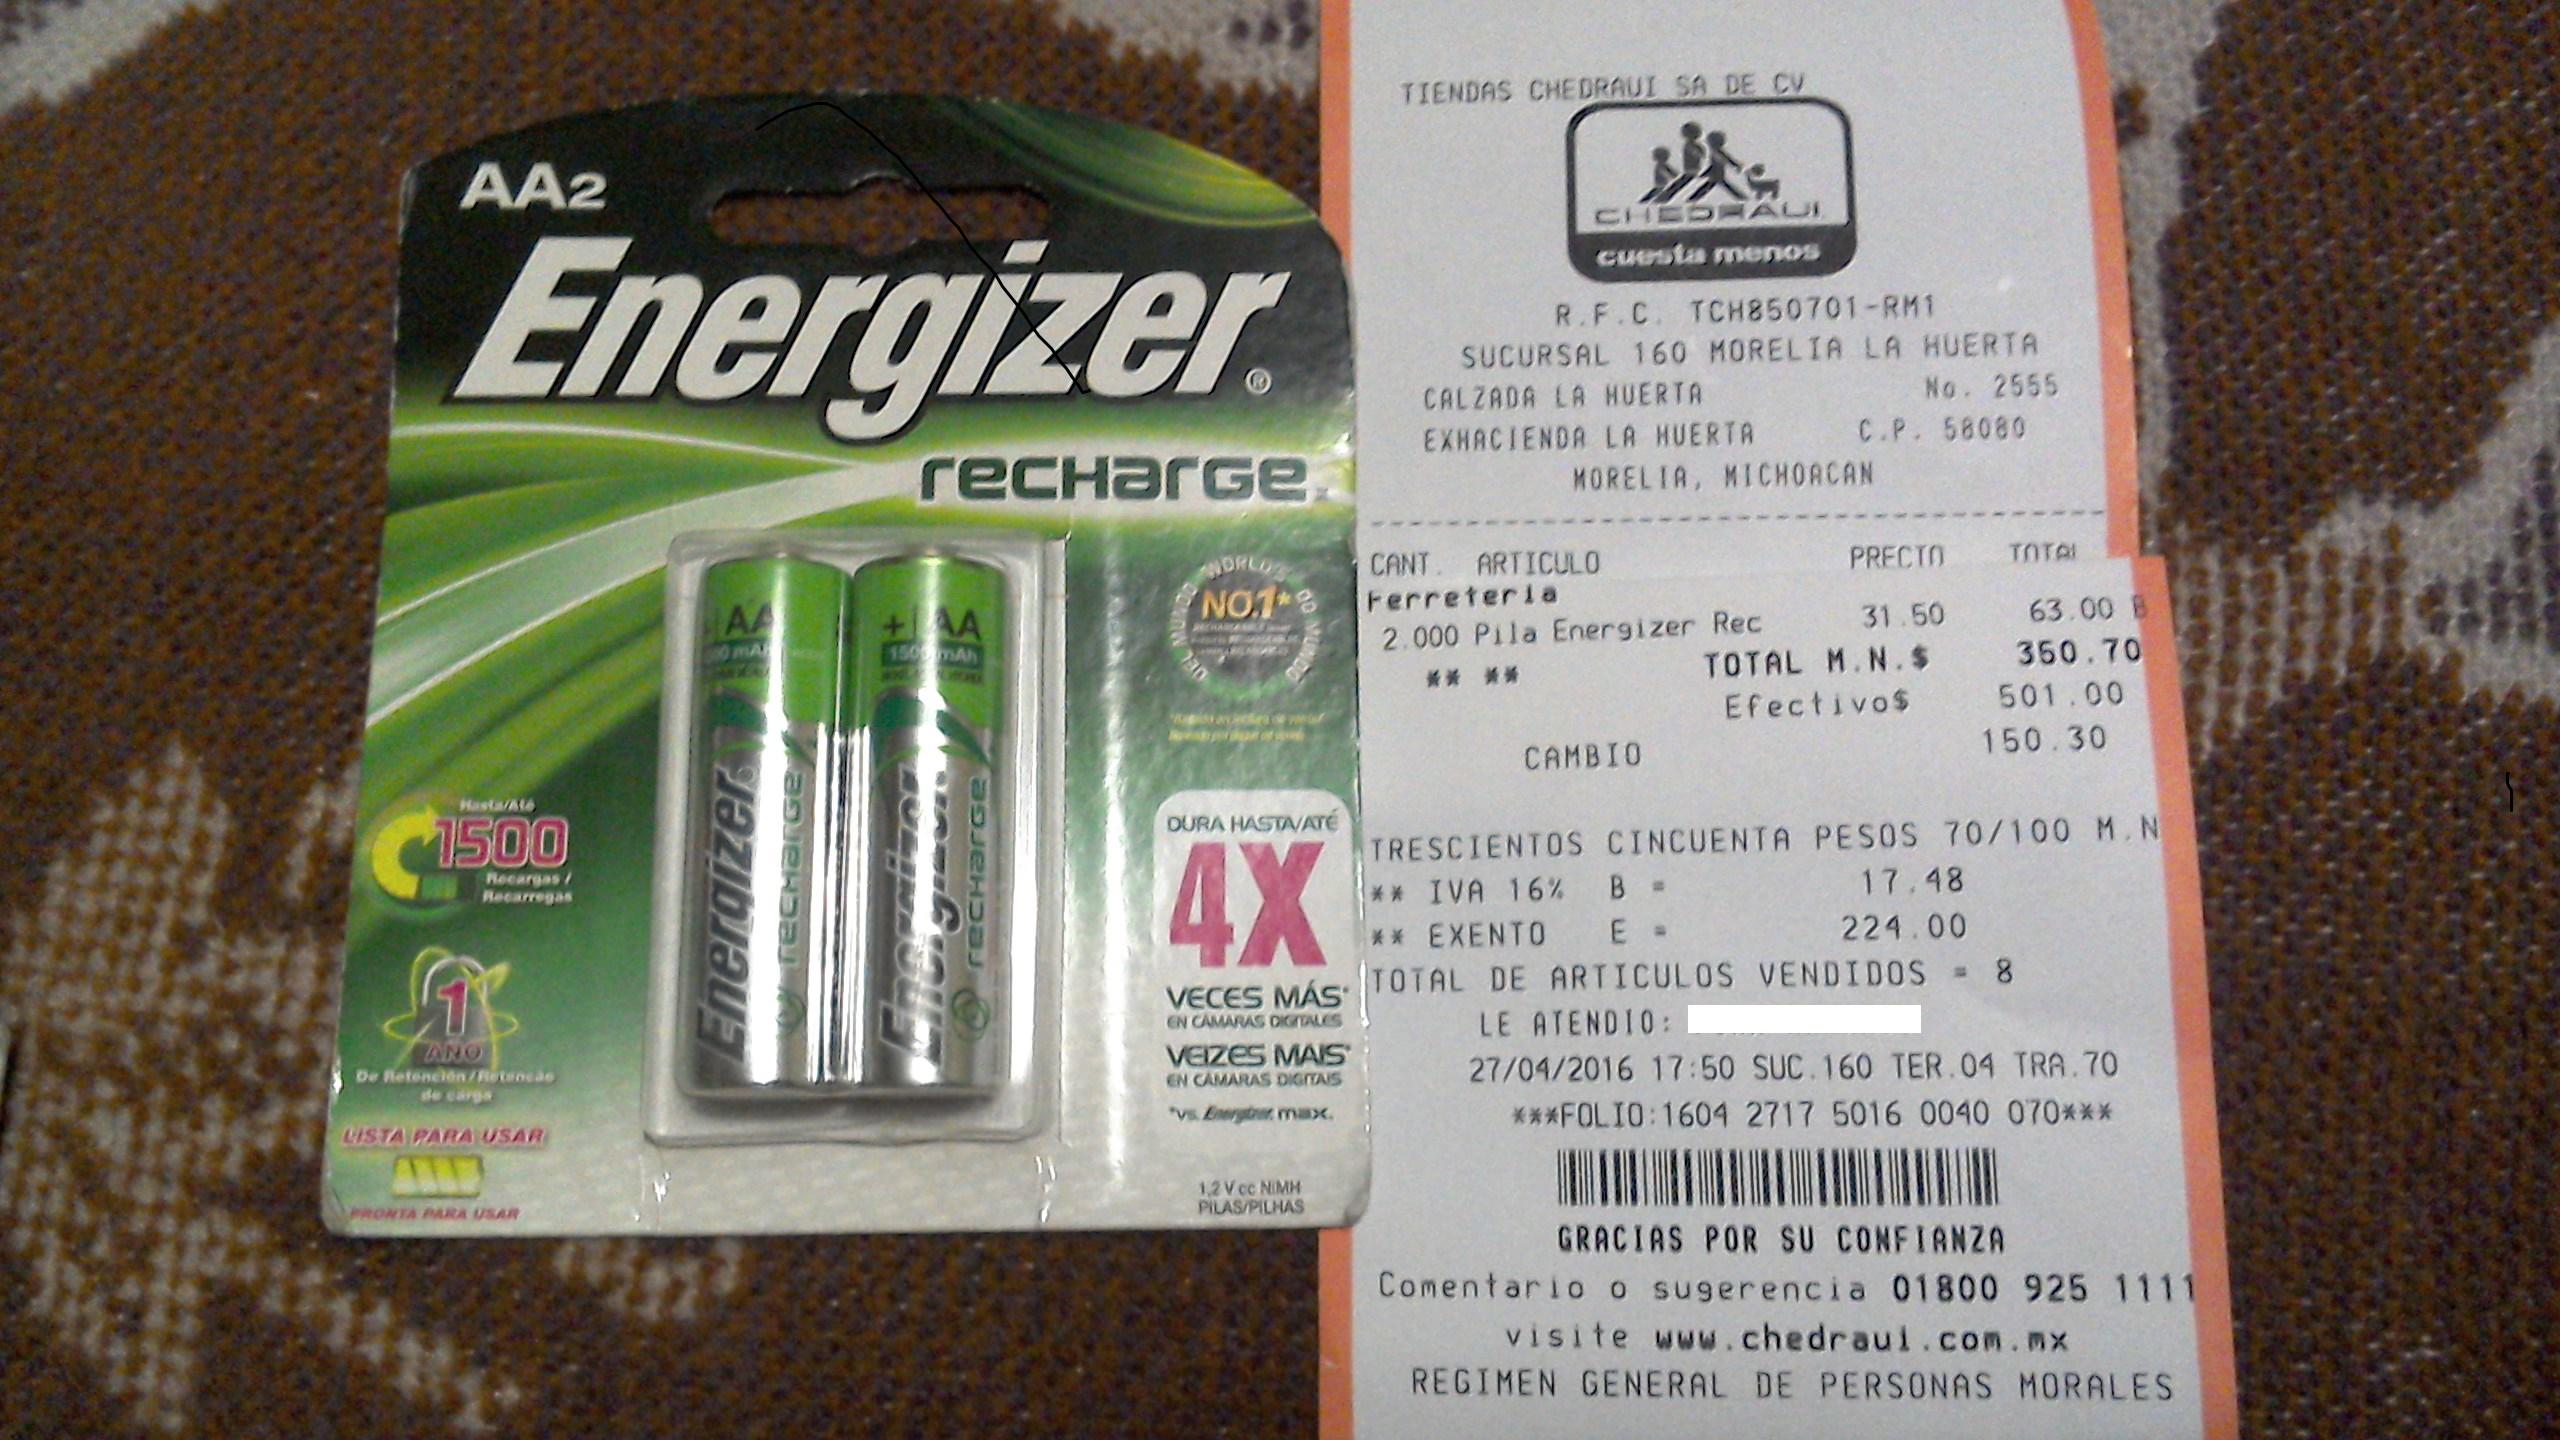 Chedraui Morelia Huerta: Pilas Energizer Recargables a $31.50